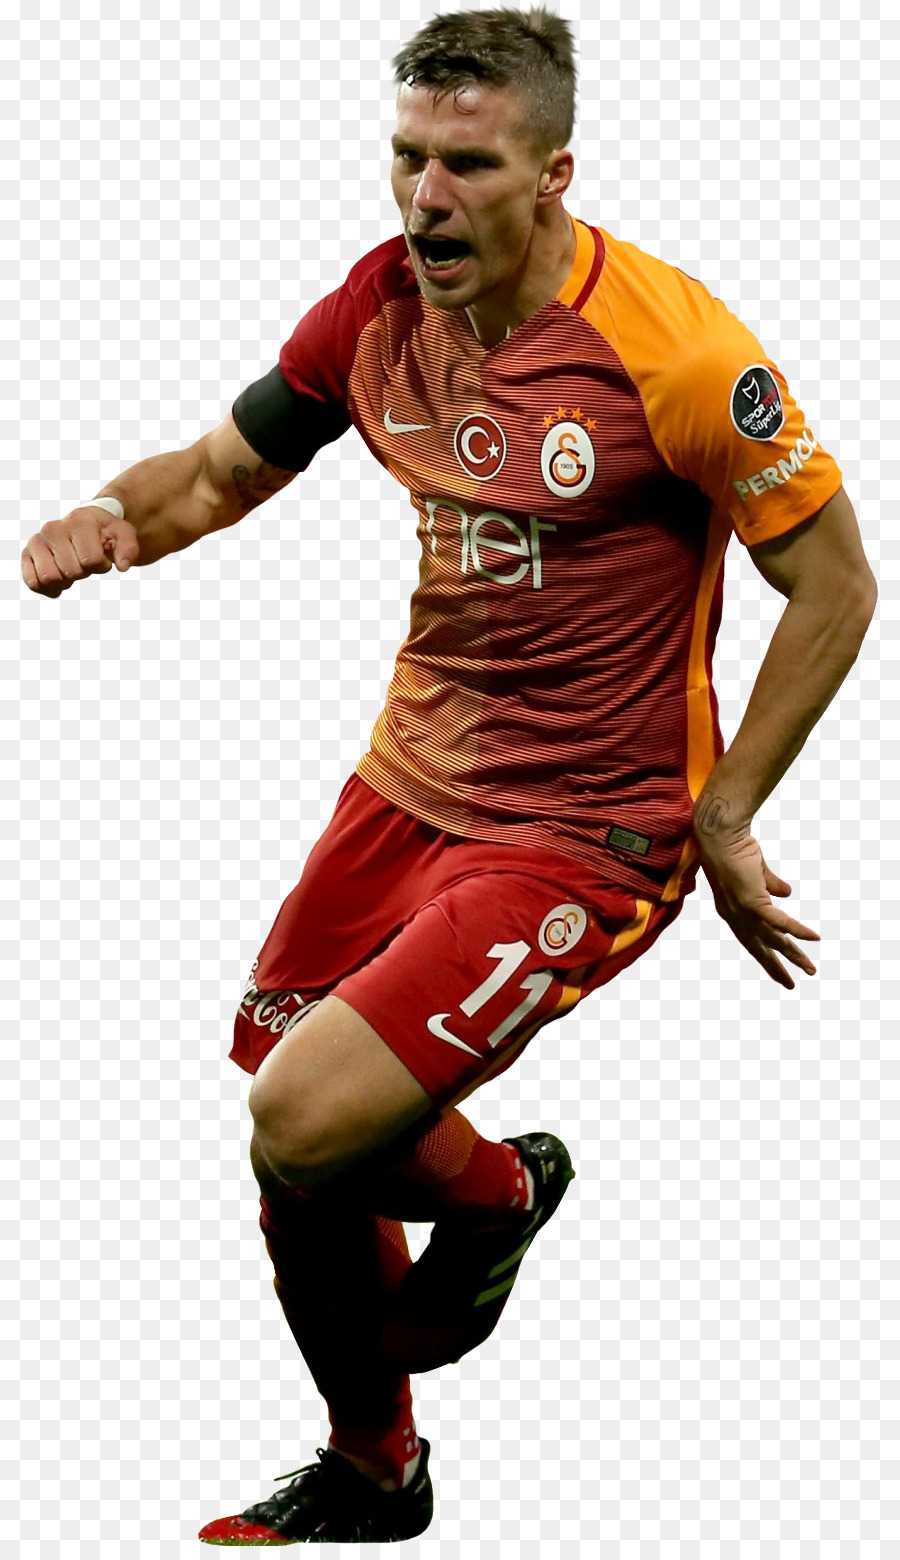 205a88e95c7 Lukas Podolski Galatasaray S.K. Germany national football team ...